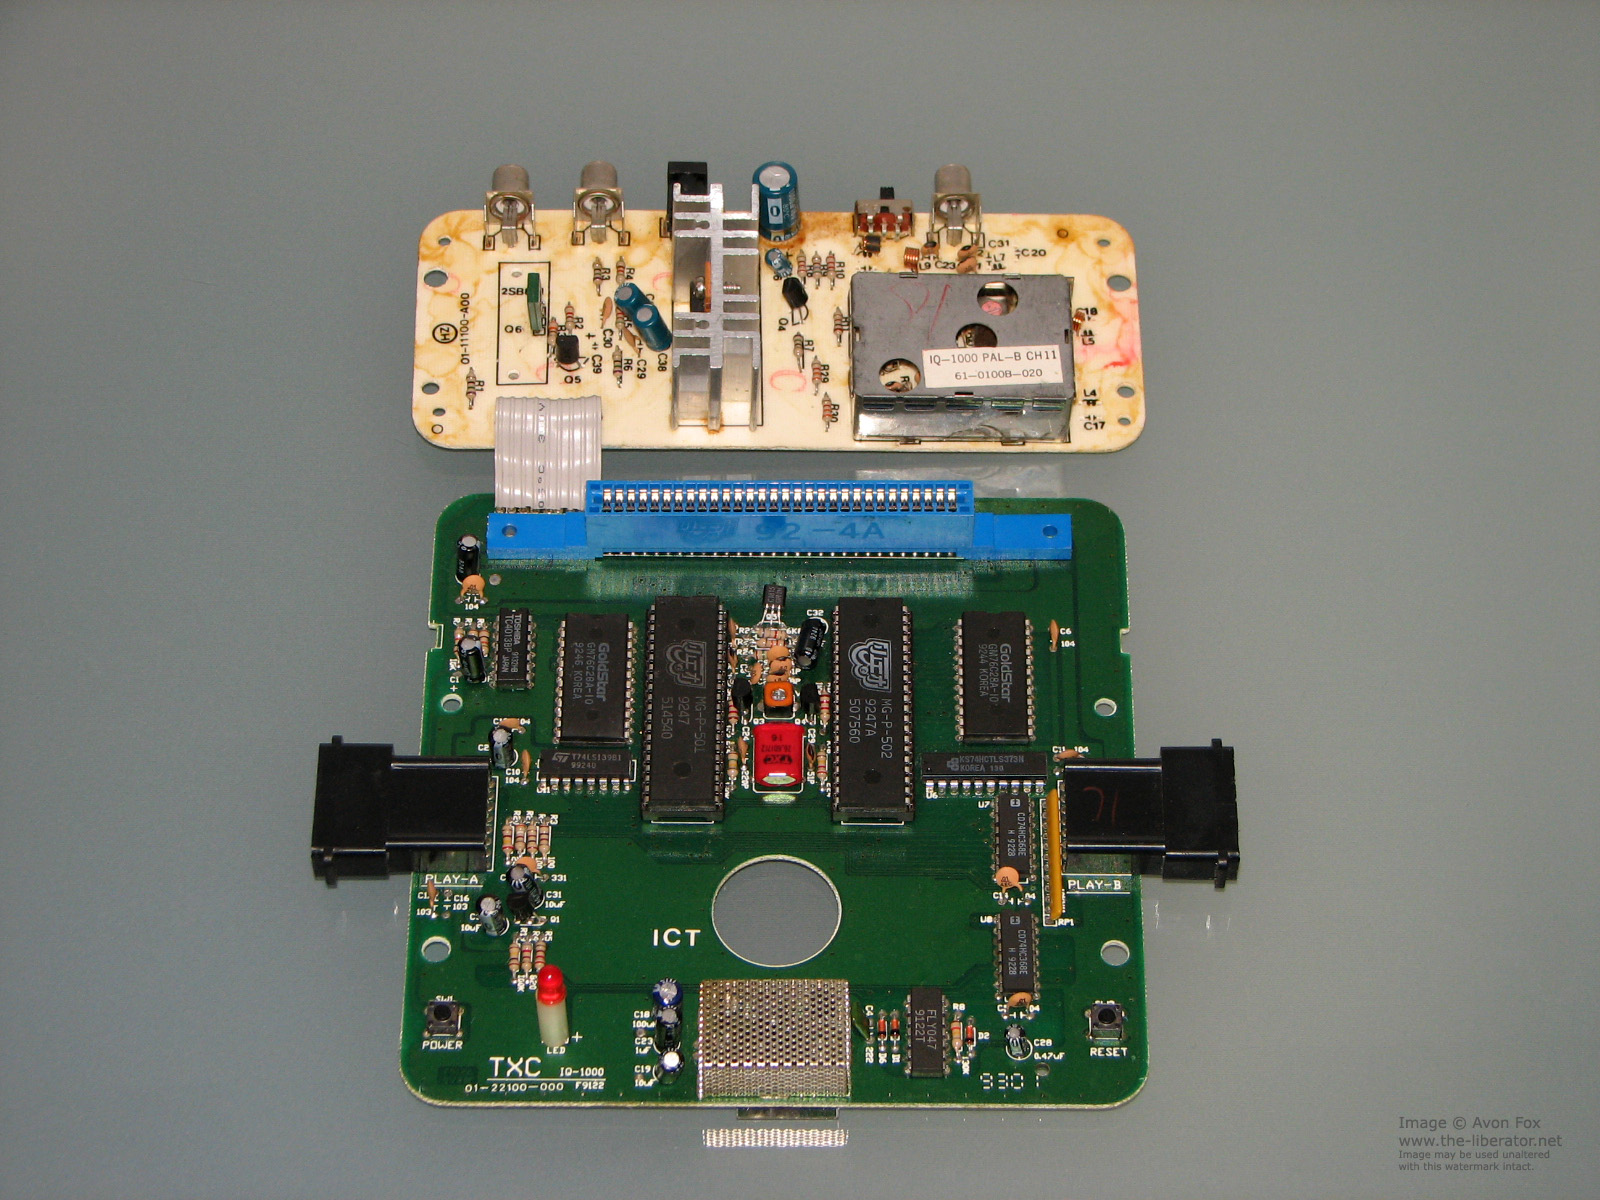 polaris 07 iq 600 wiring schematic 07 polaris rmk 900